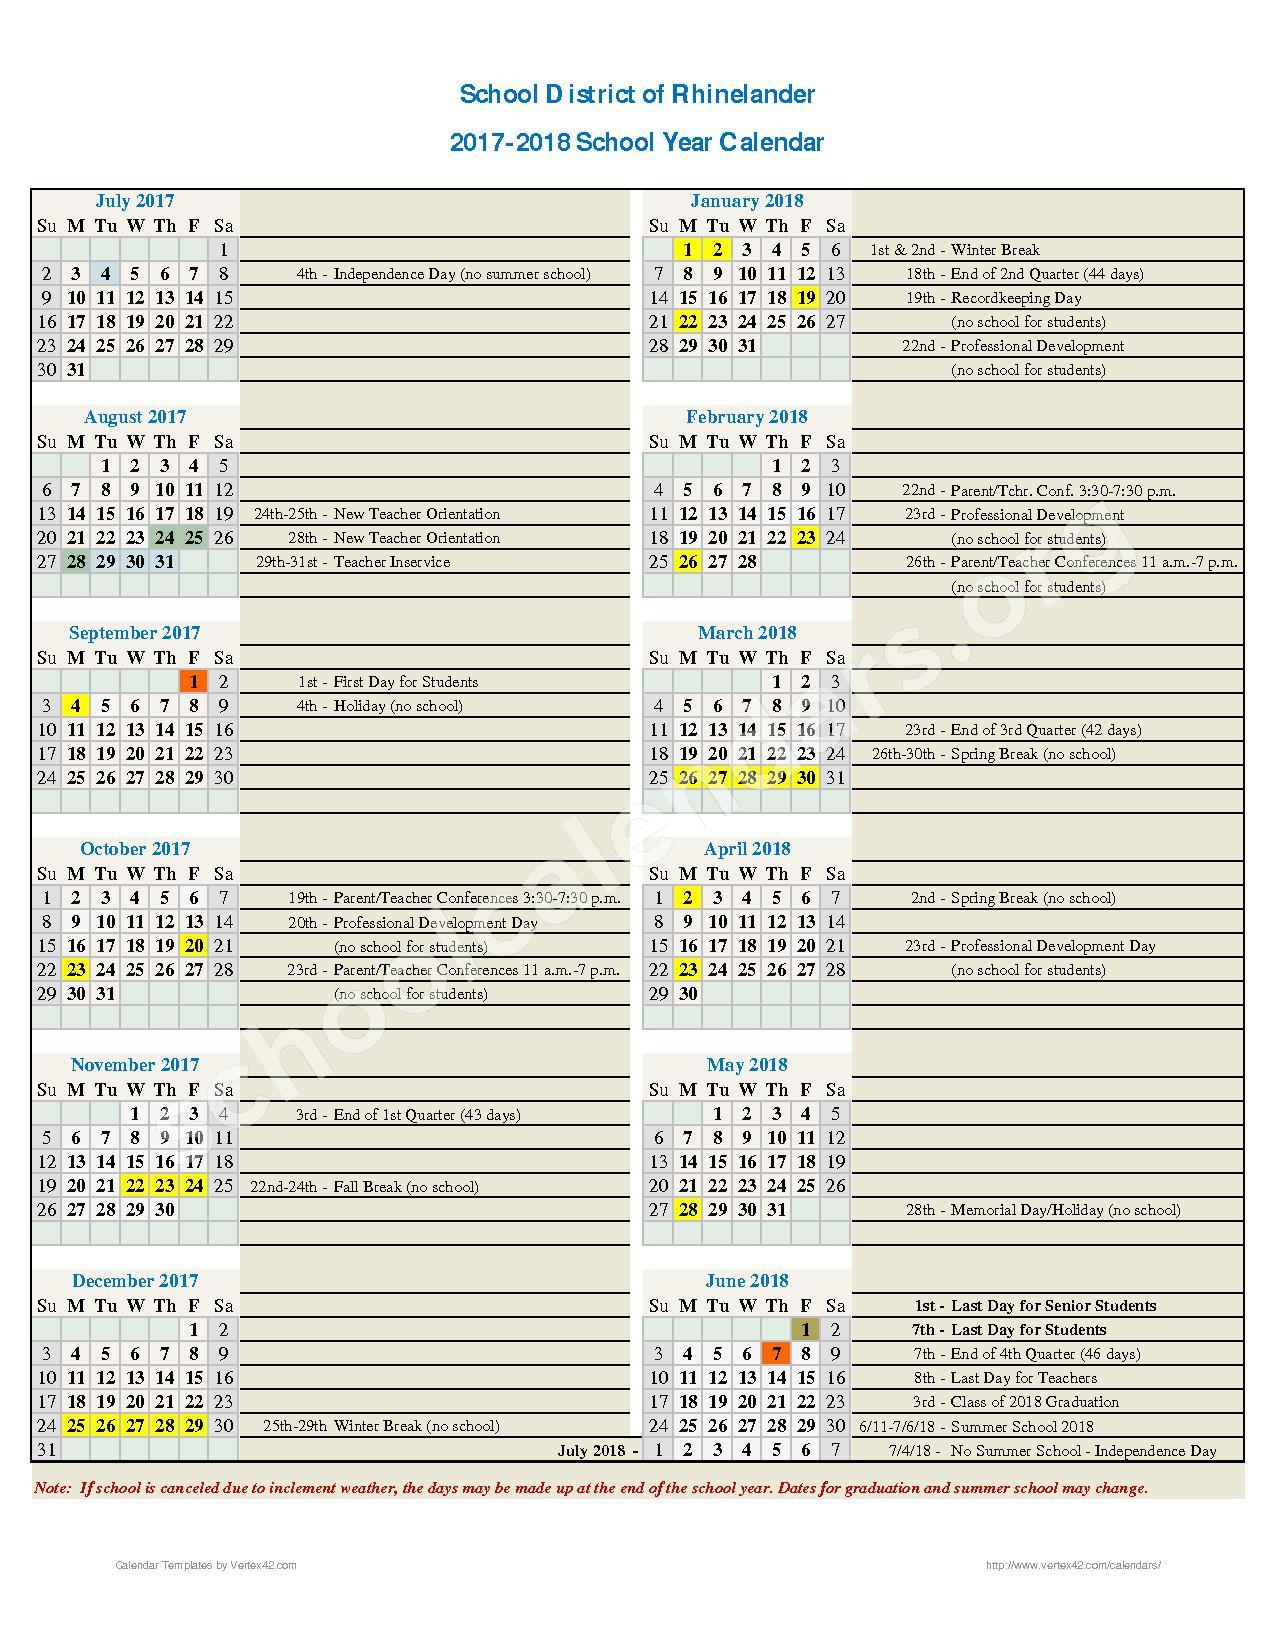 2017 - 2018 School Calendar – Rhinelander School District – page 1